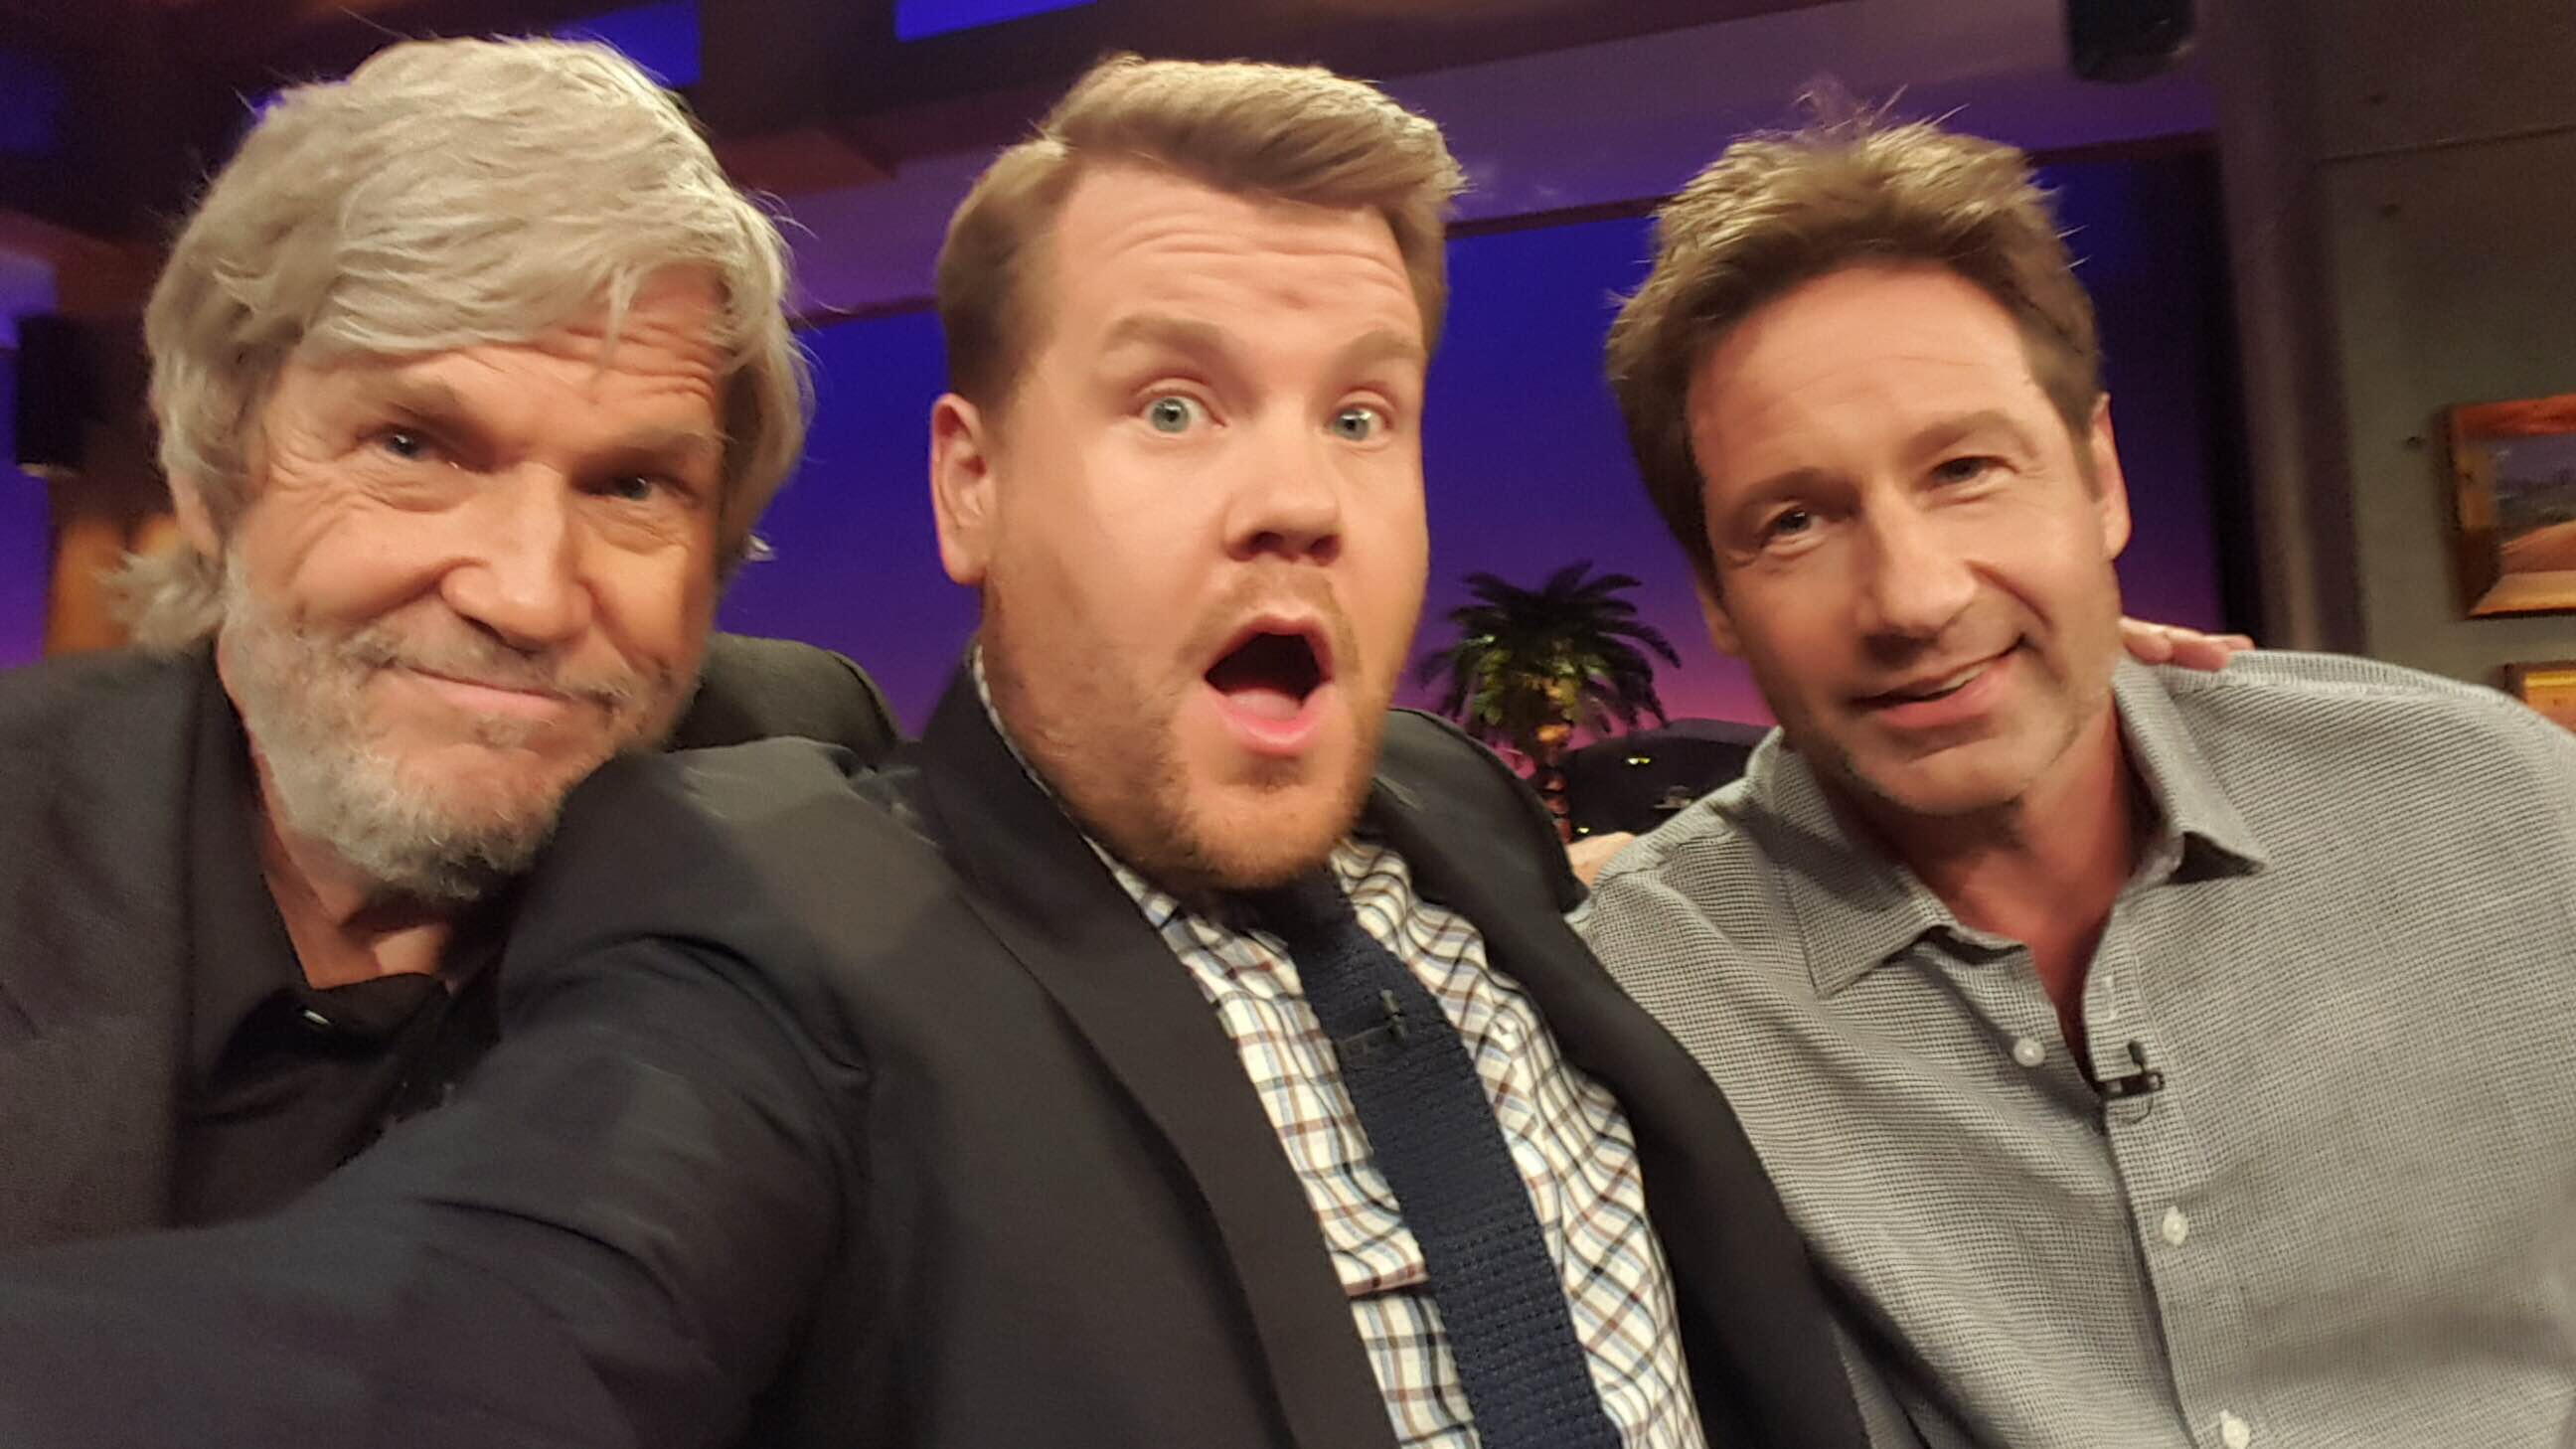 Jeff Bridges and David Duchovny